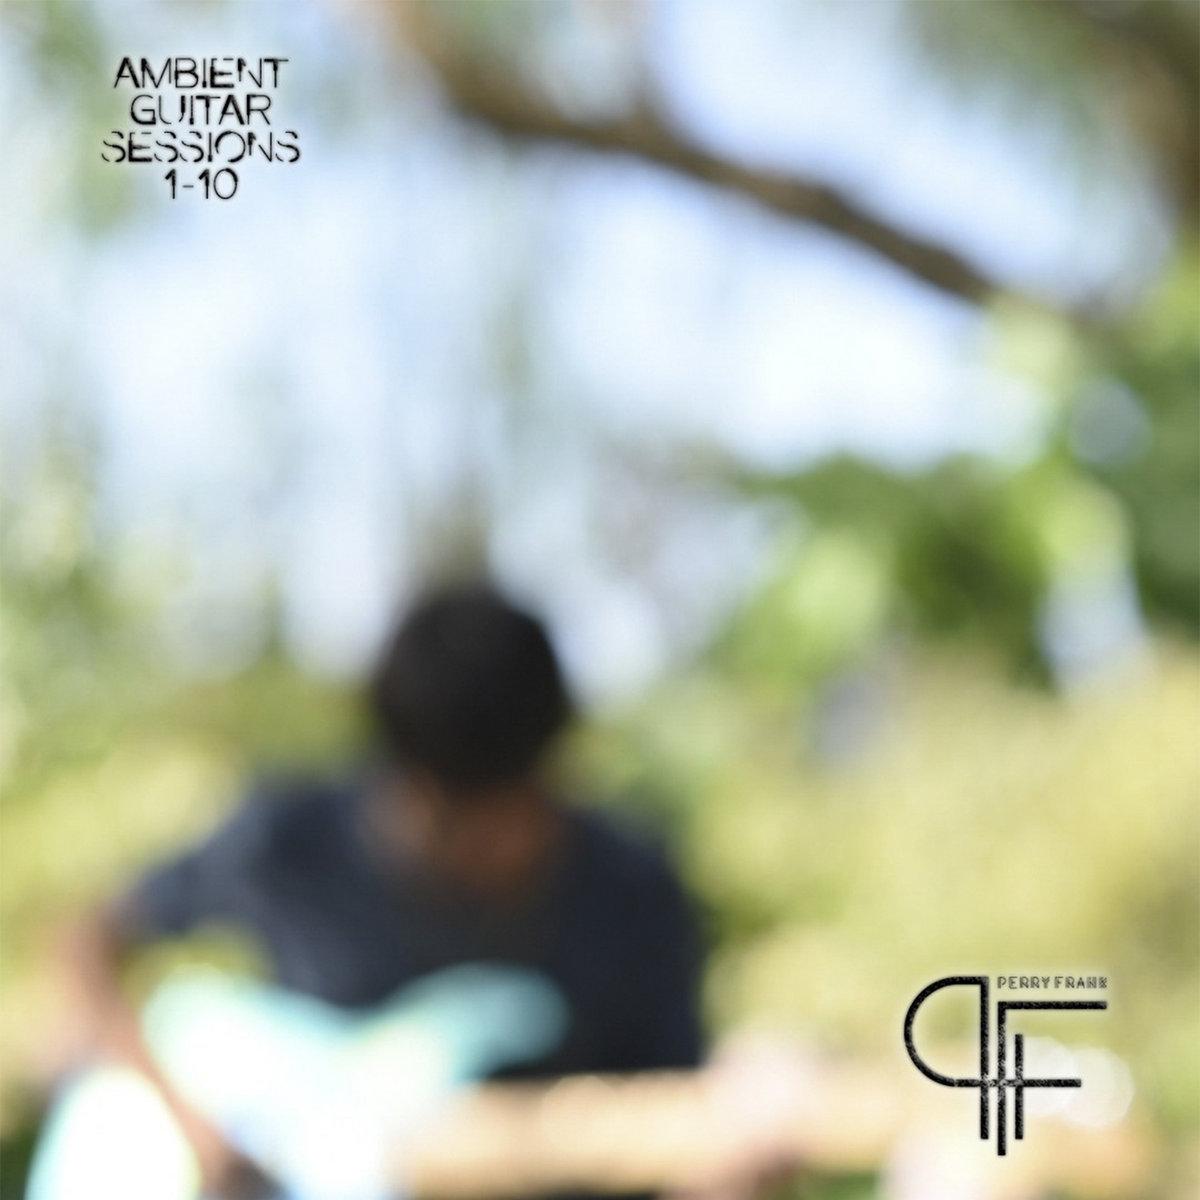 Perry Frank - Ambient Guitar Sessions - 1-10 - Francesco Perra - Bandcamp - player - 2019 - Sa Scena Sarda